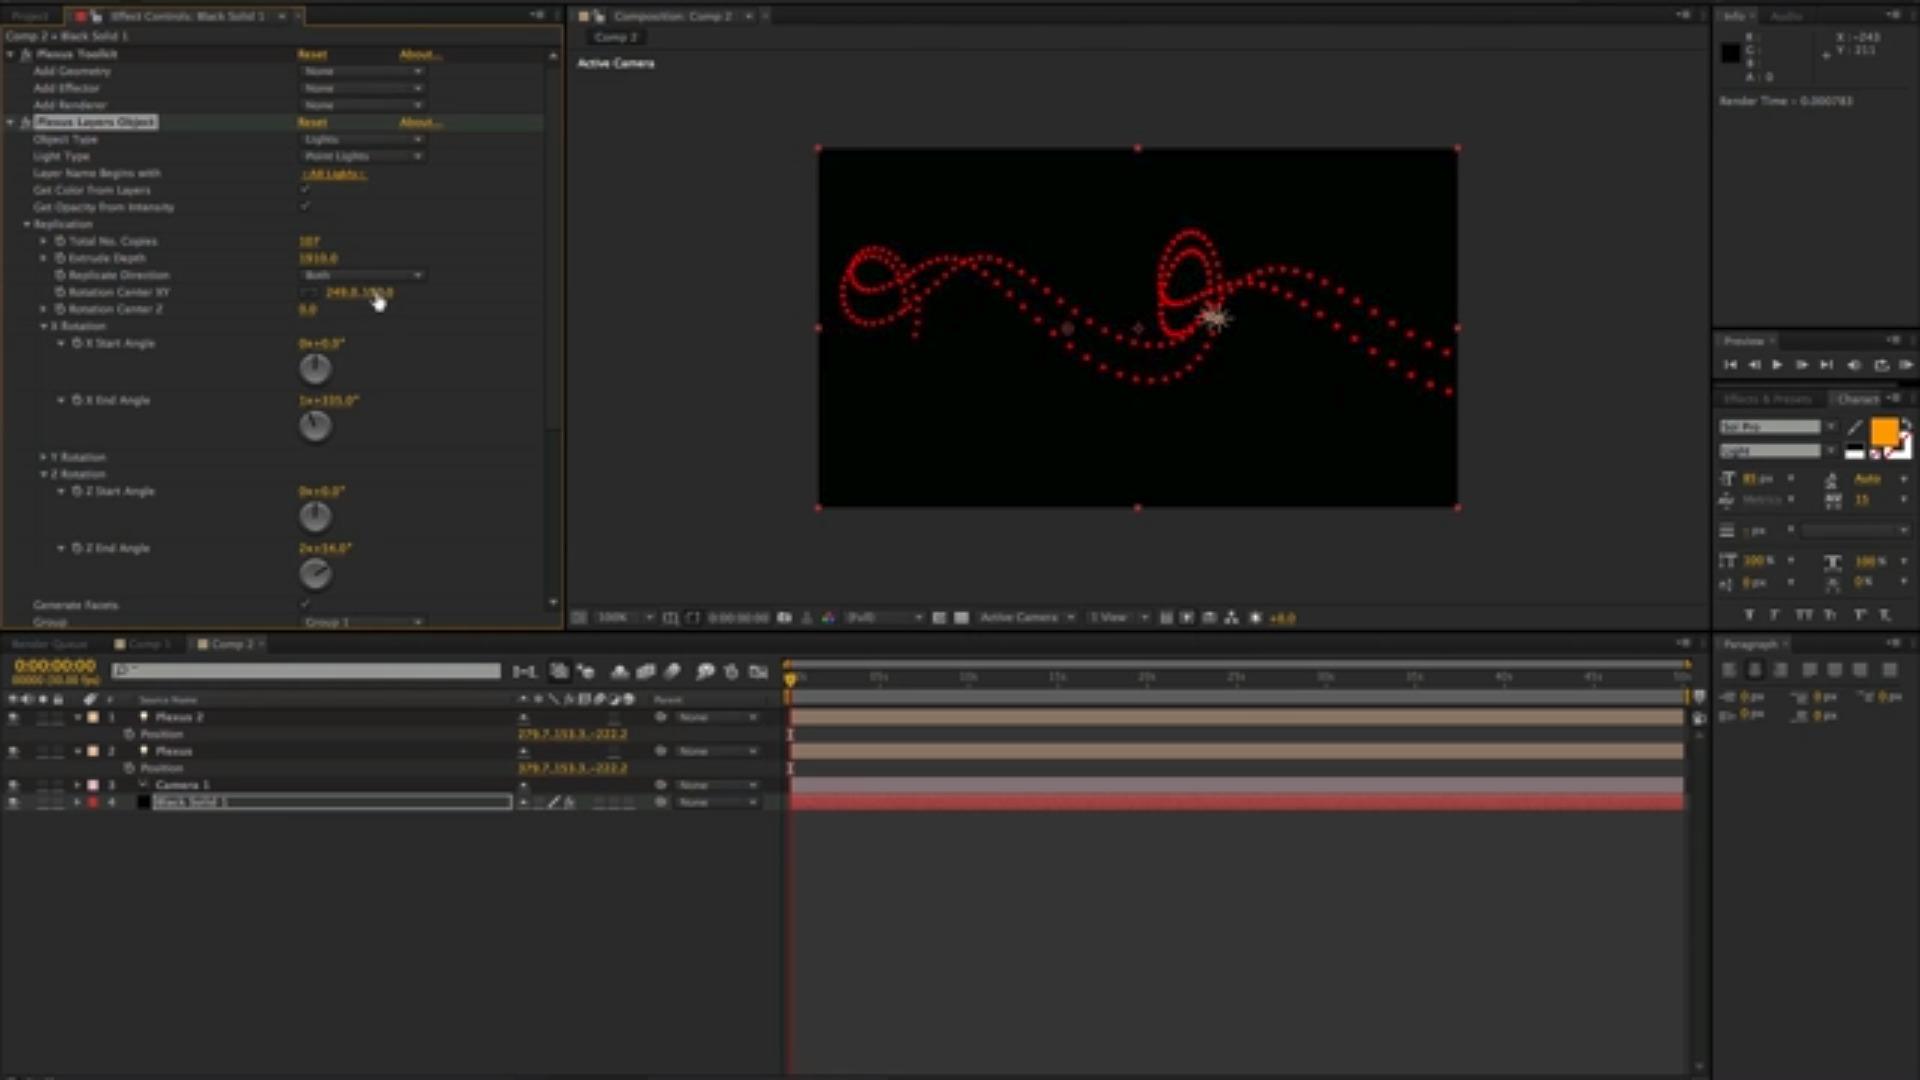 Rowbyte Plexus for Adobe After Effects v3.x (Floating Server License) - additional image 2